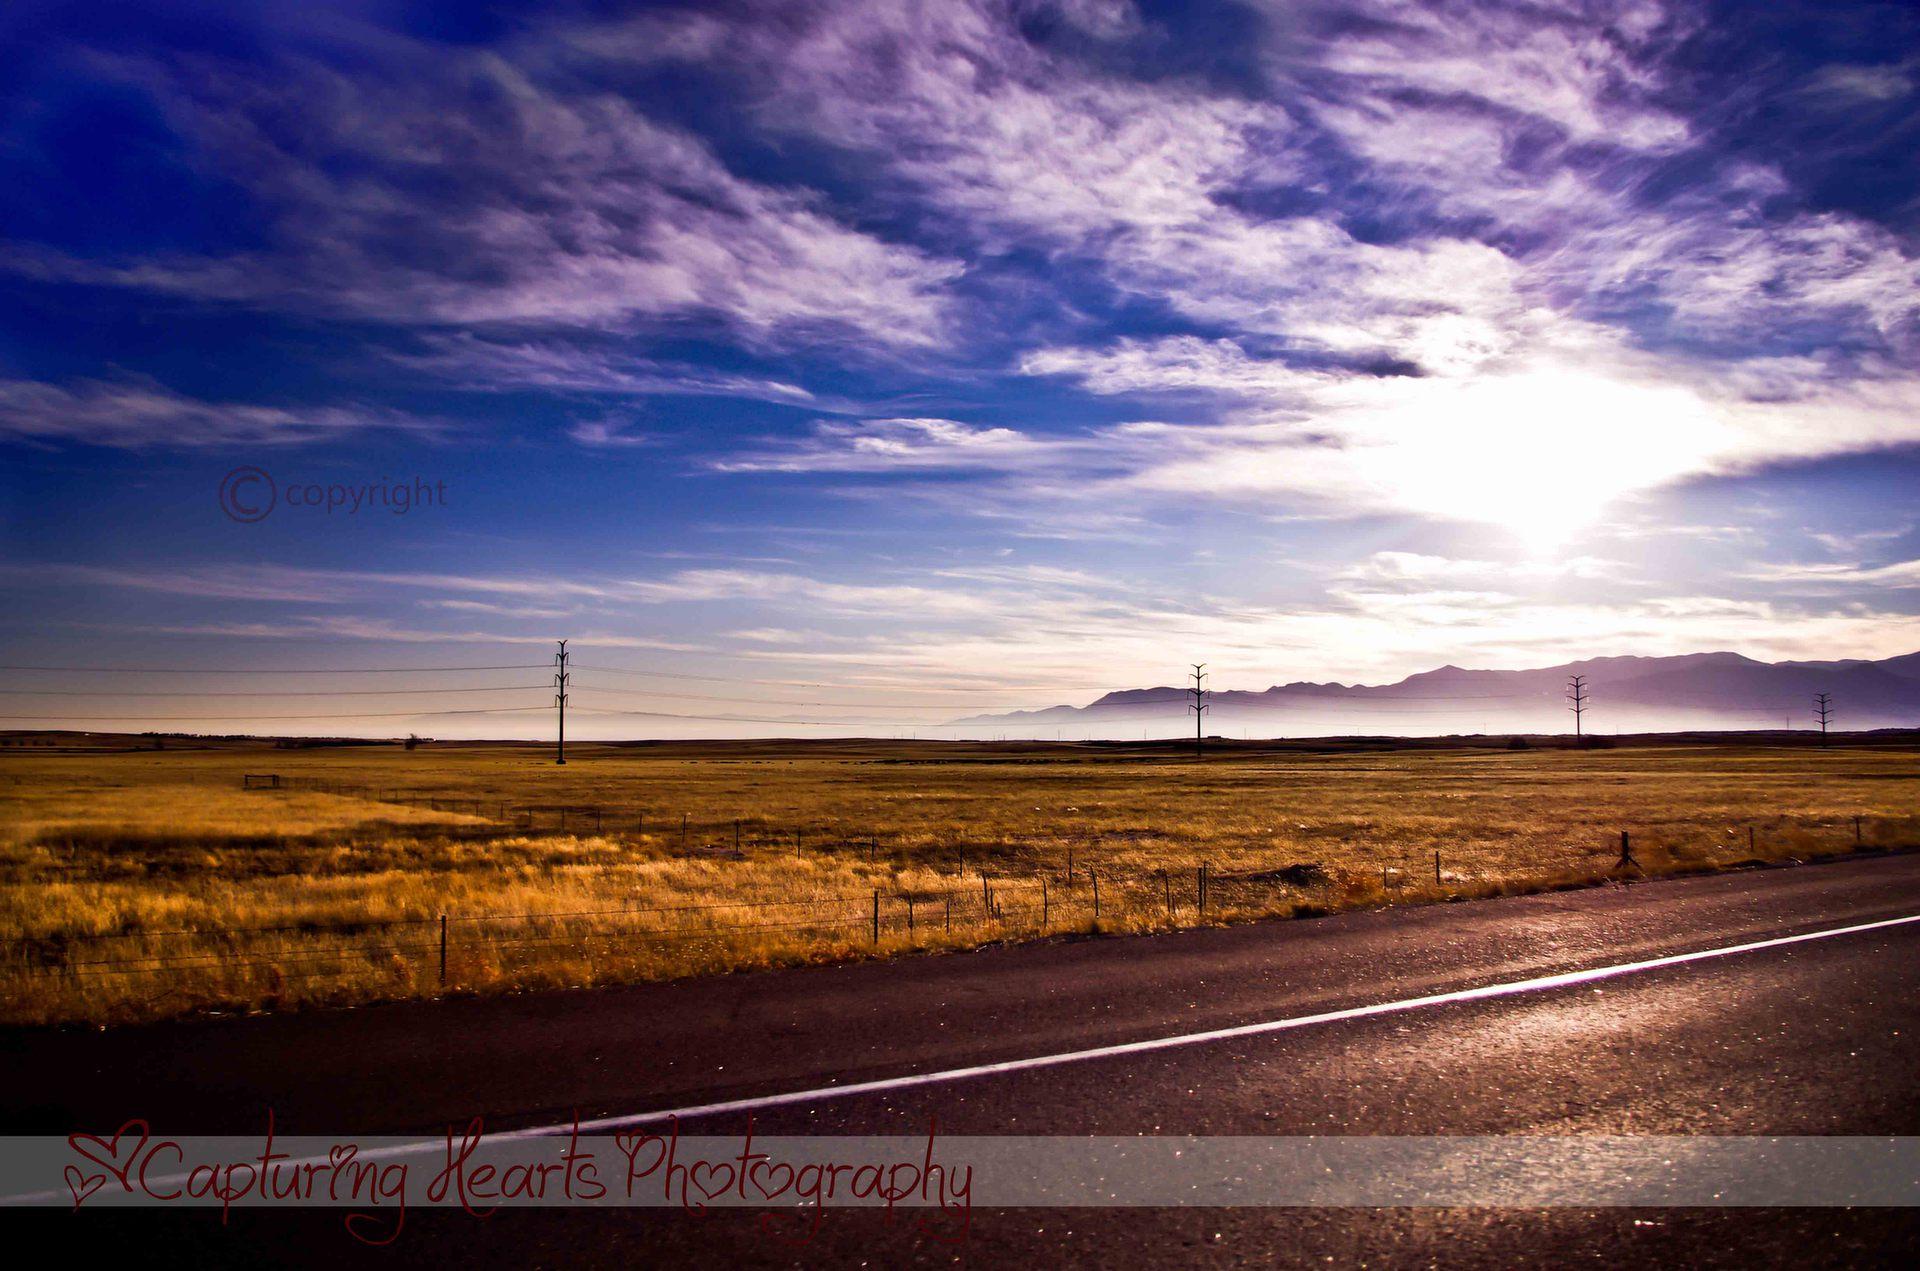 Colorado+Springs+Rocky+Mountains+Road+Grassy+Field+COPYRIGHTLQ